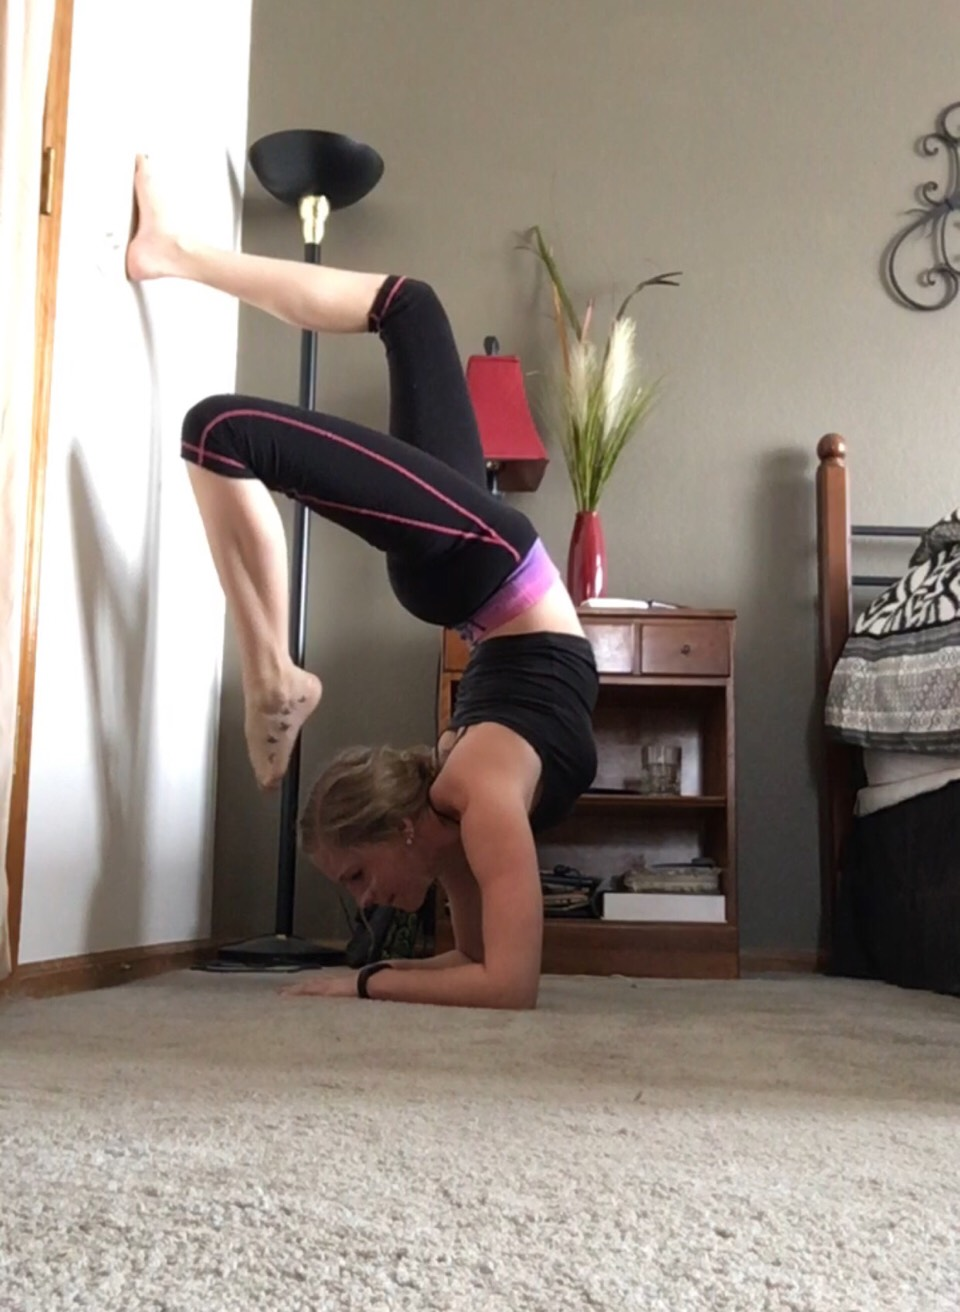 Yoga poses to balance, flexablitiy and weightloss❤️